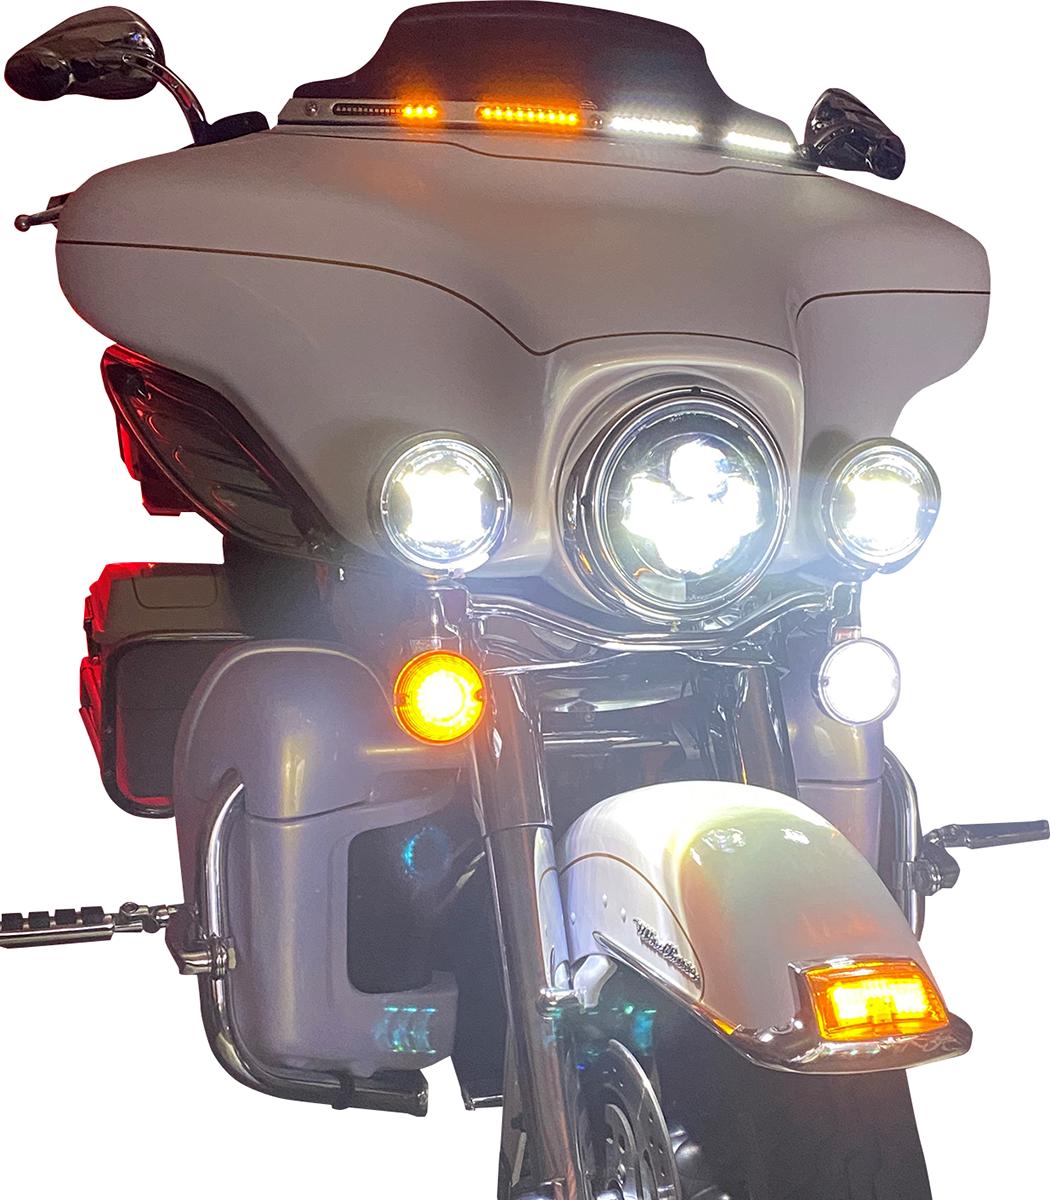 Custom Dynamics LED Batwing Fairing Windshield Trim 1996-2005 Harley Touring